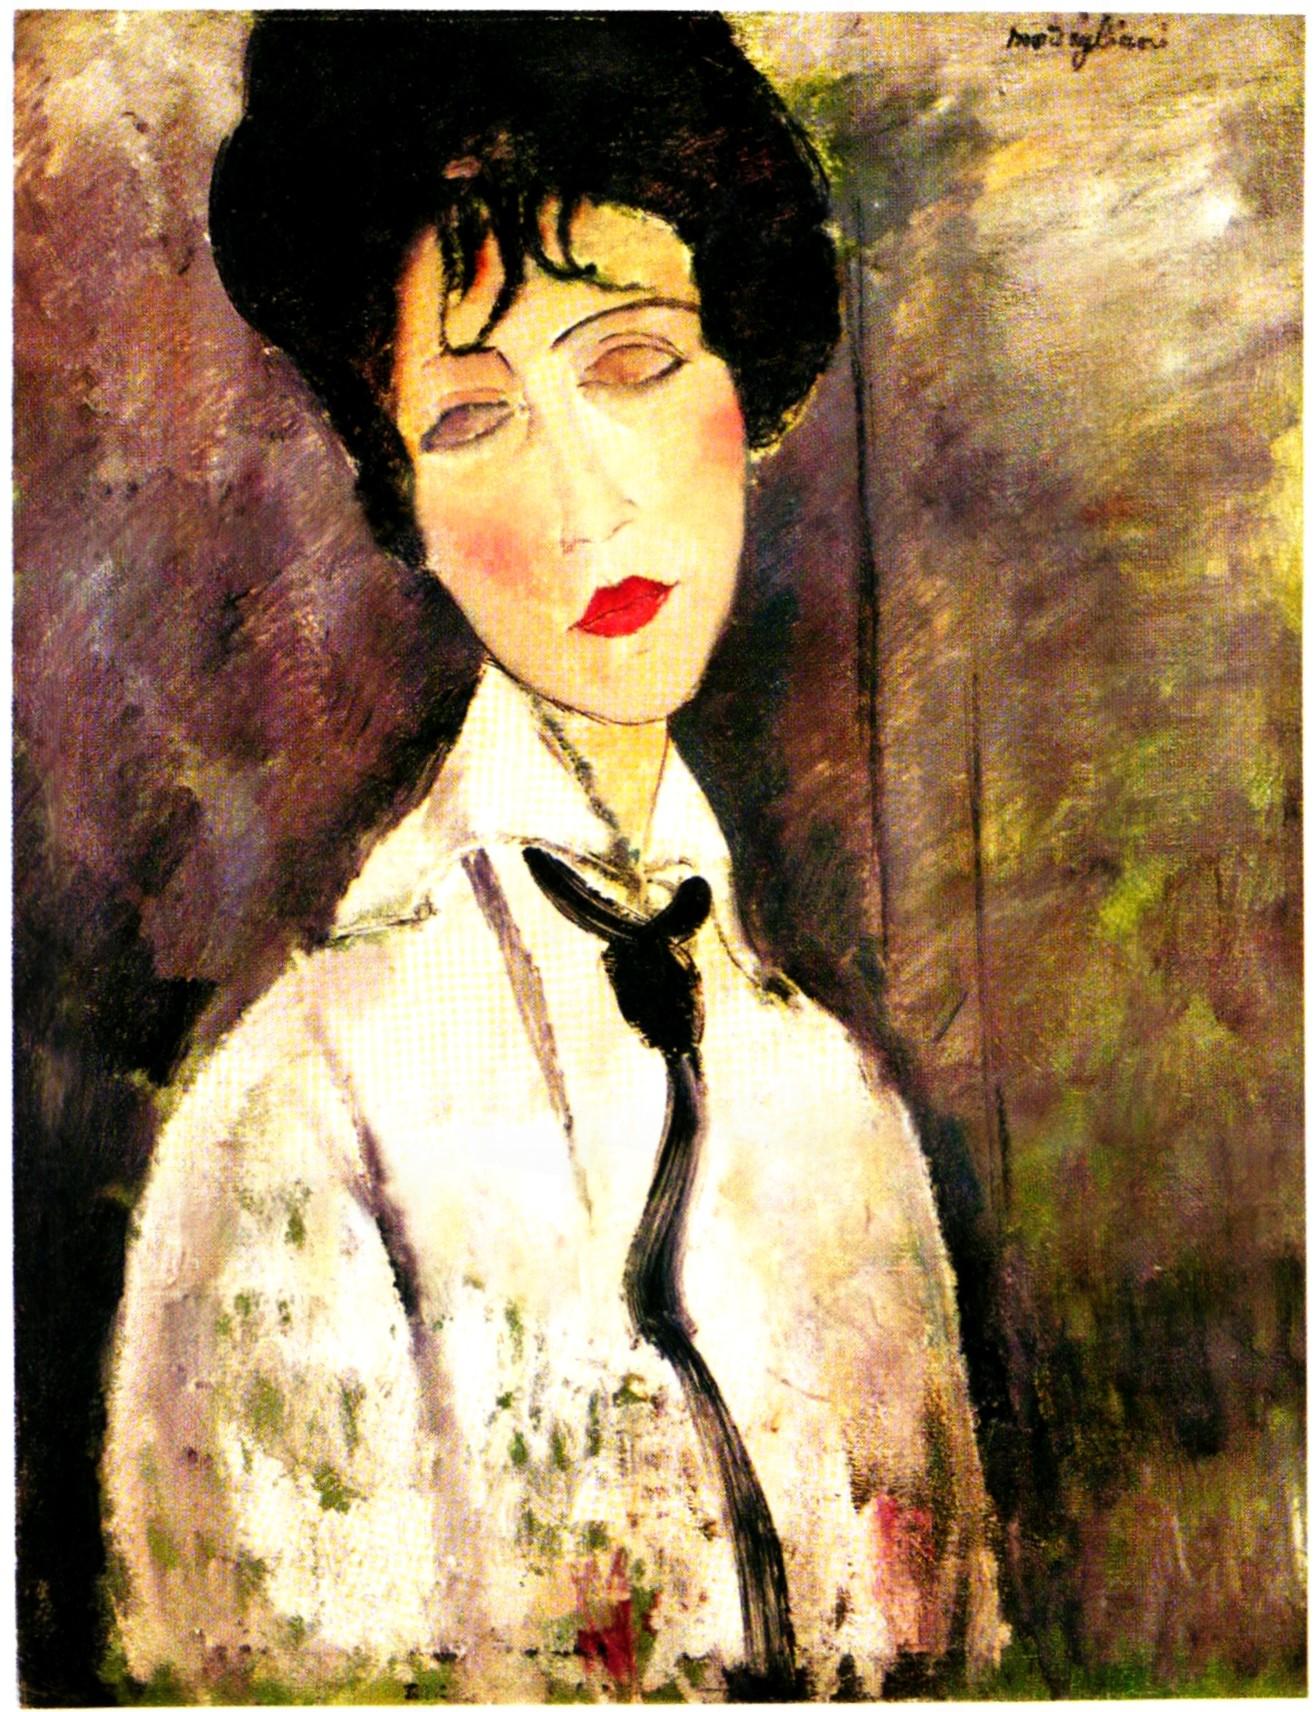 Donna in cravatta: femminilità e originalità - Cravatte ...